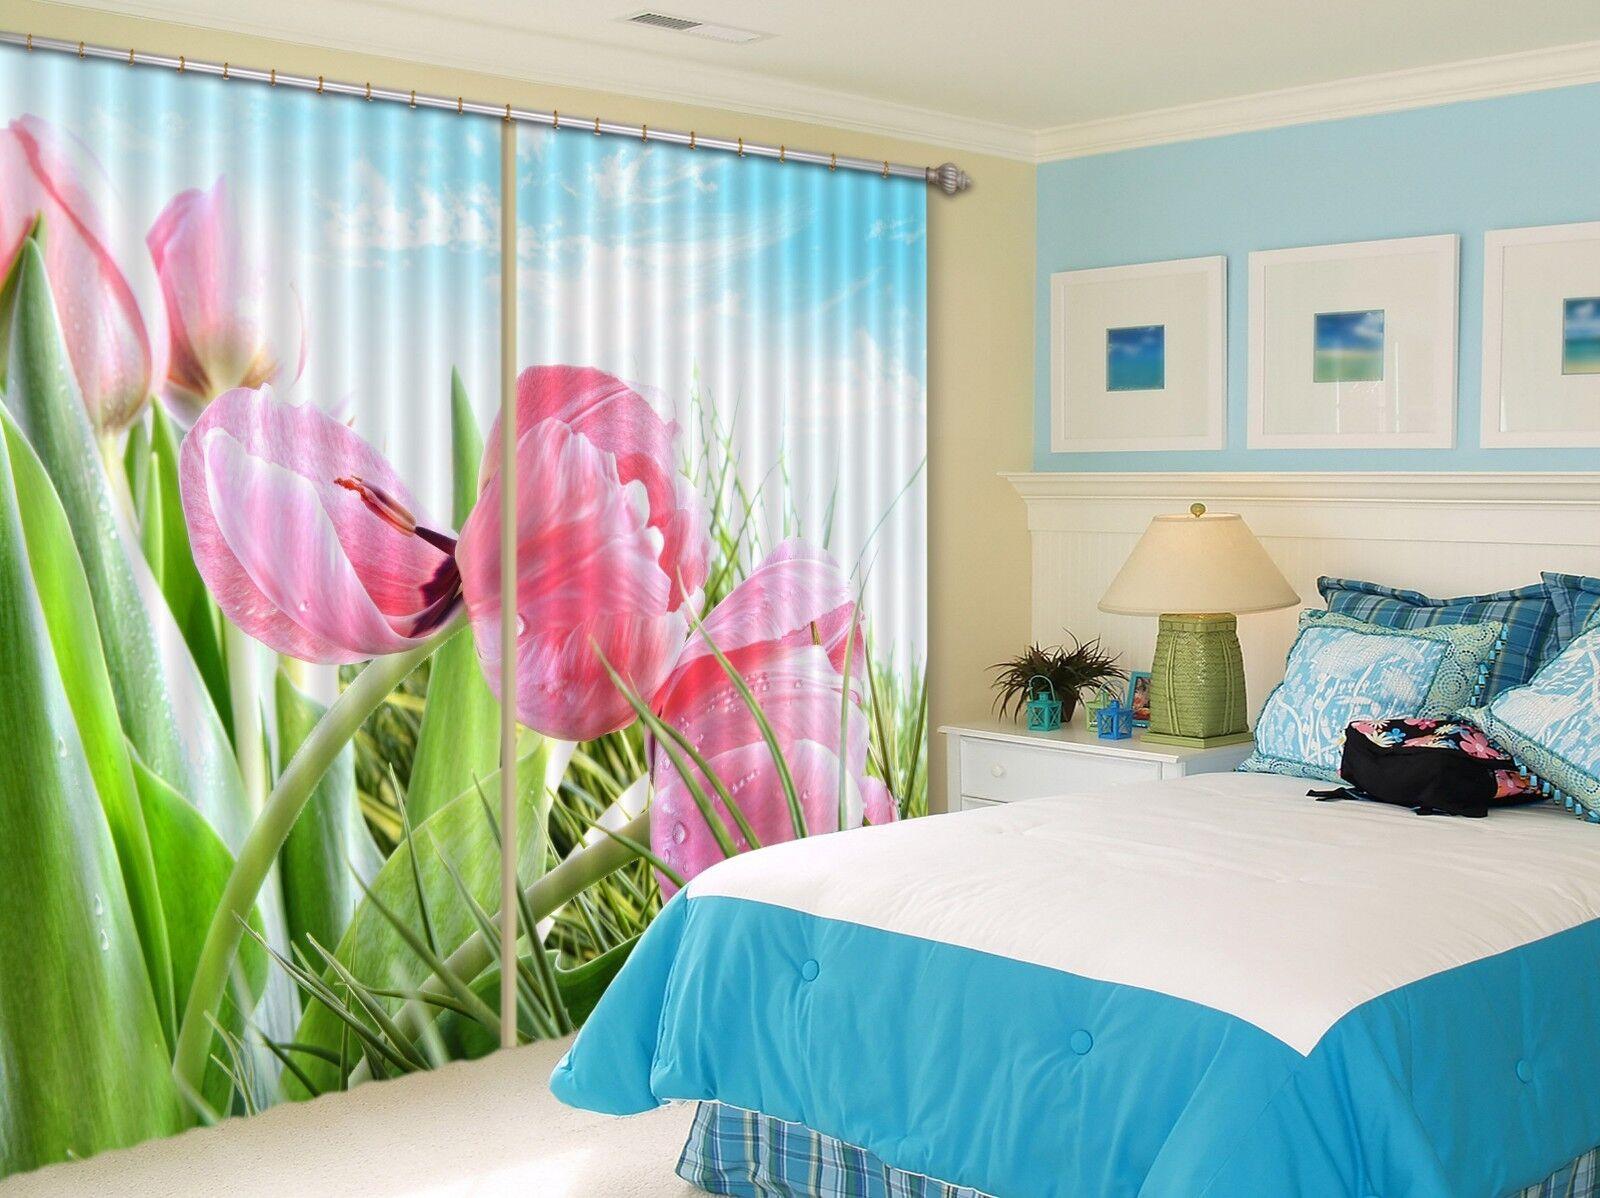 3D Flores 709 Cortinas de impresión de cortina de foto Blockout Tela Cortinas Ventana au